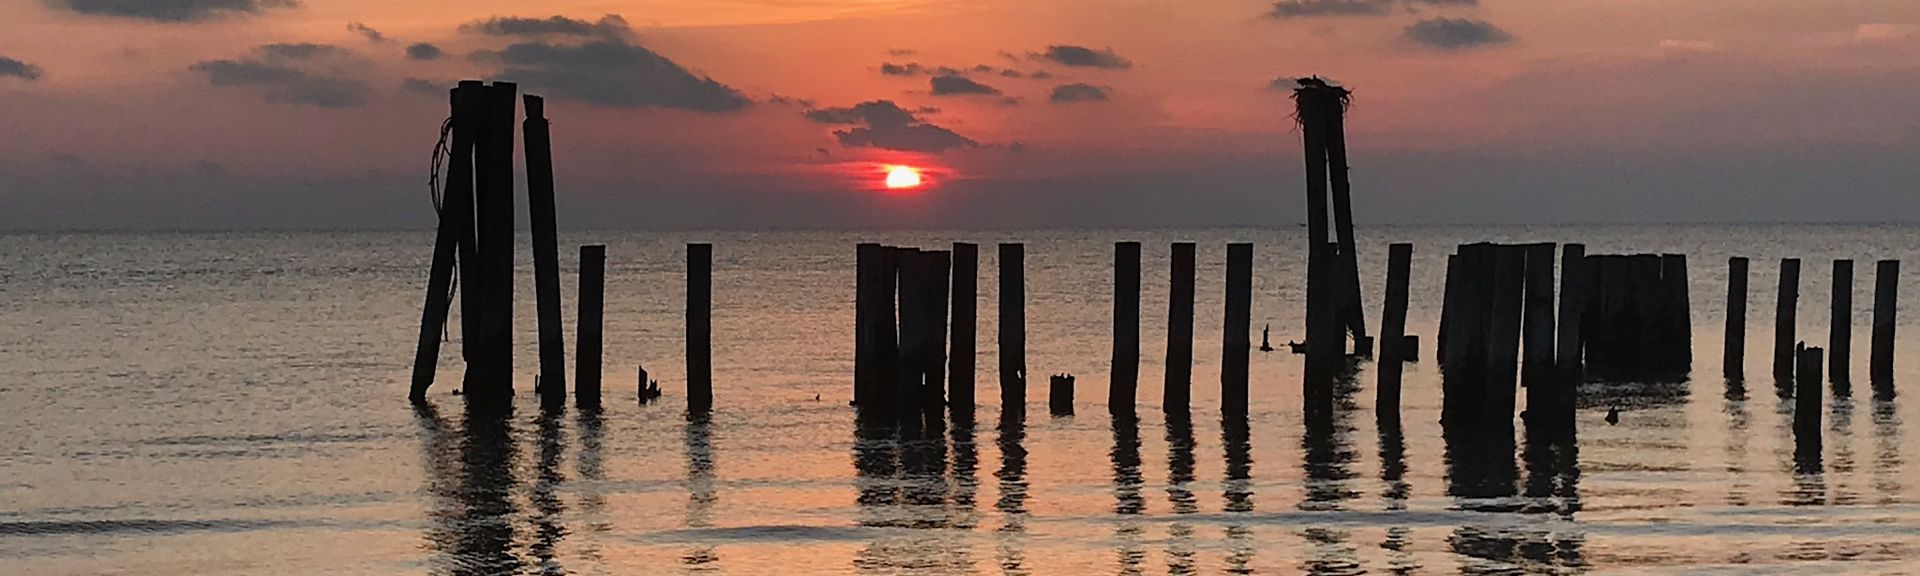 Cape Charles Beach, Cape Charles, VA, USA